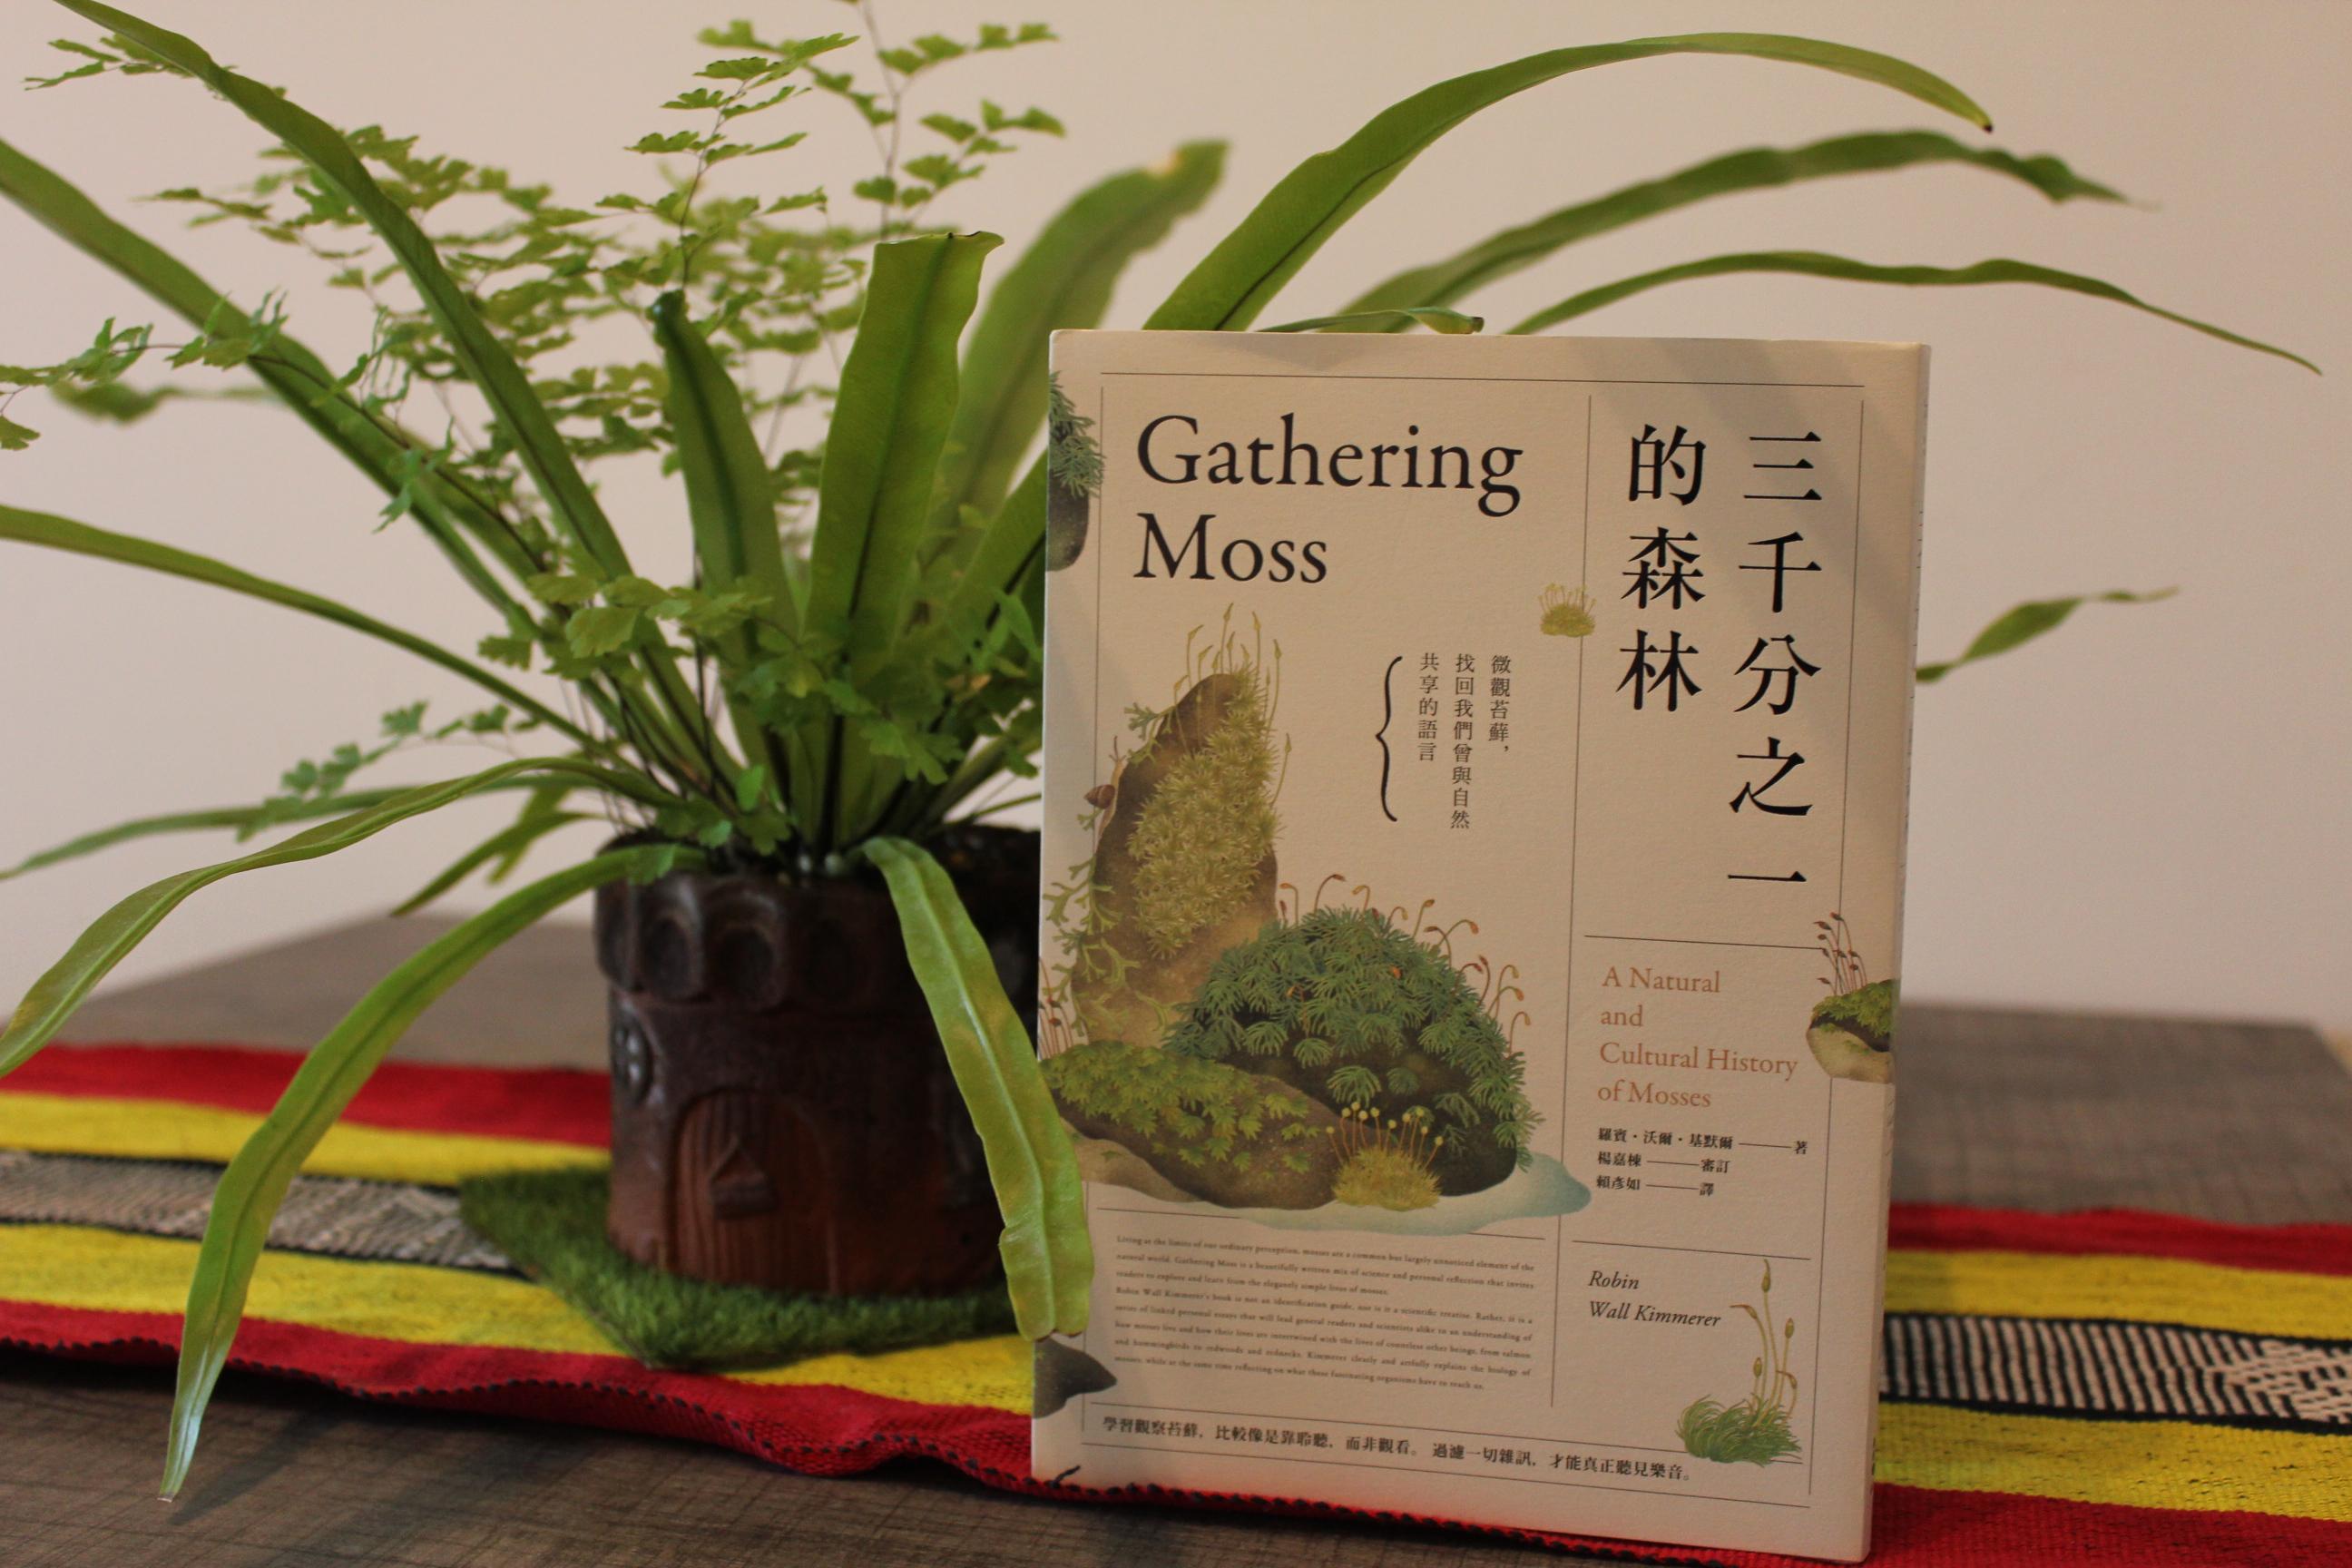 第12集(2021/6/3)WFH Book-hopping Challenge Day 2: 森林裡的綠色雪花